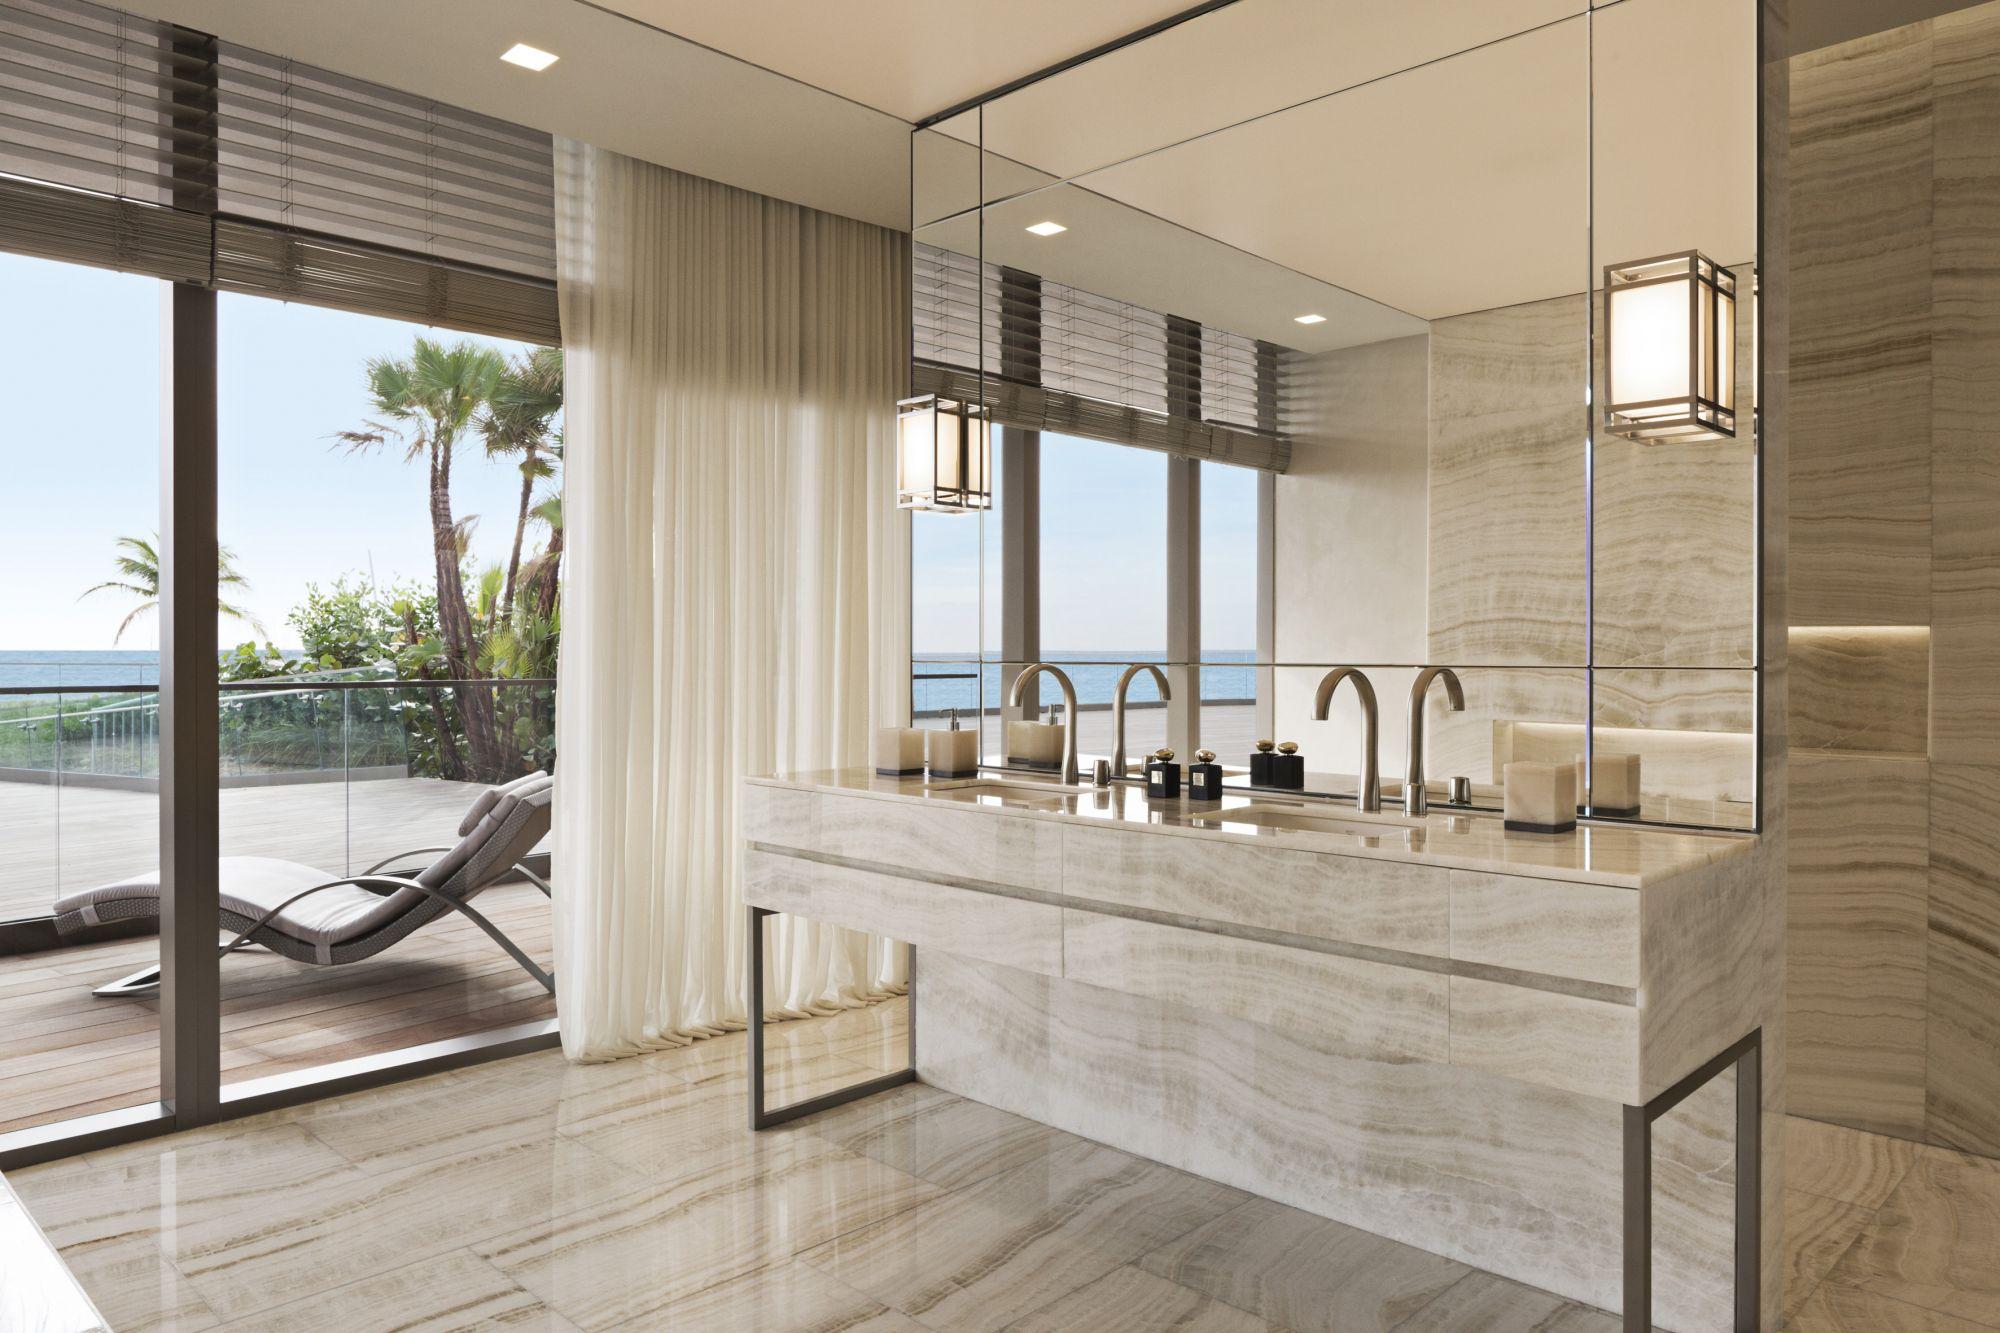 Armani/Casa Redefines Beachside Living in Florida